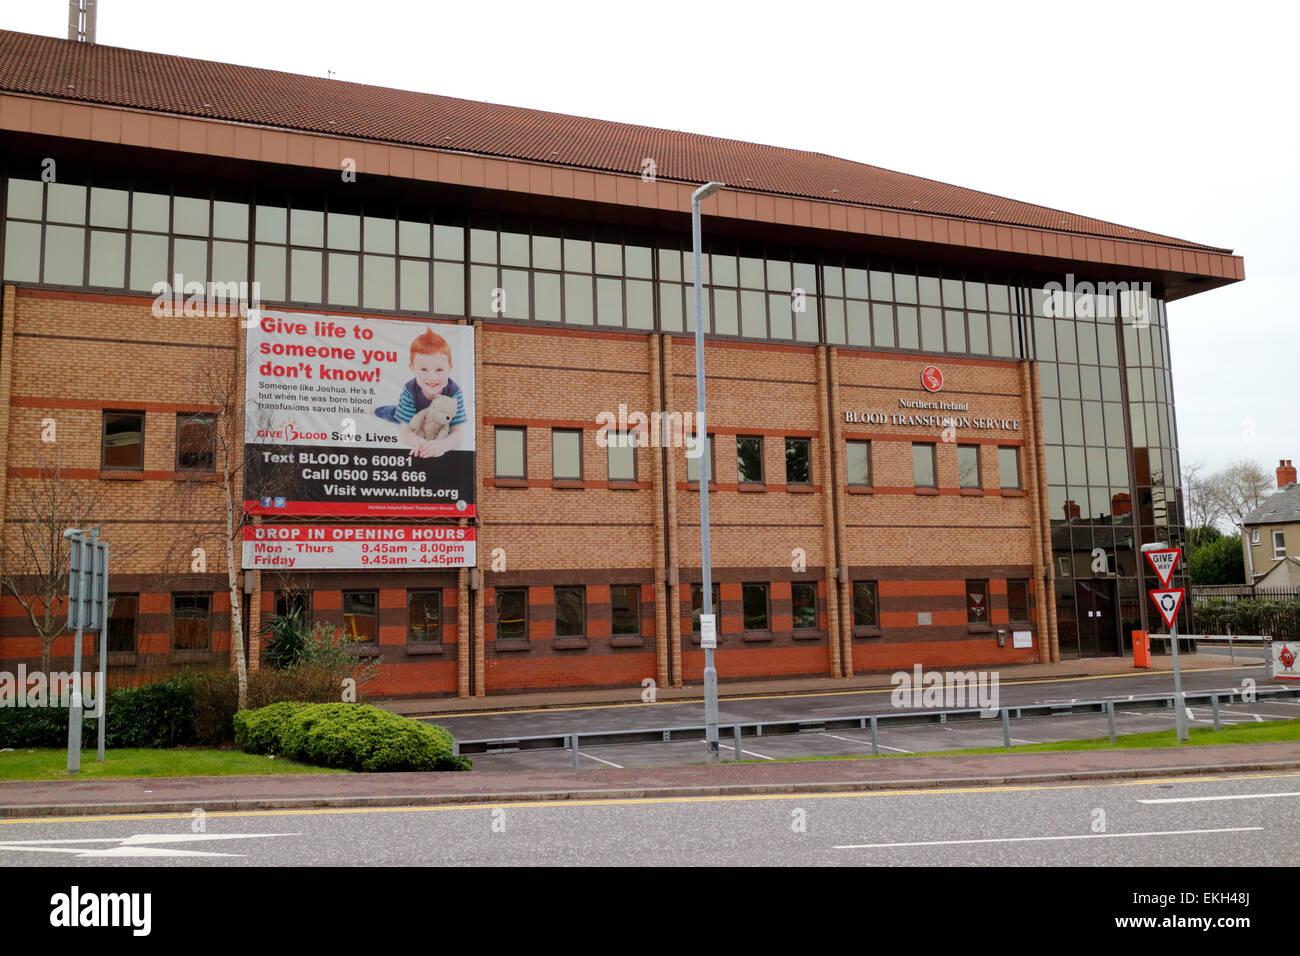 Northern Ireland blood transfusion service building Stock Photo